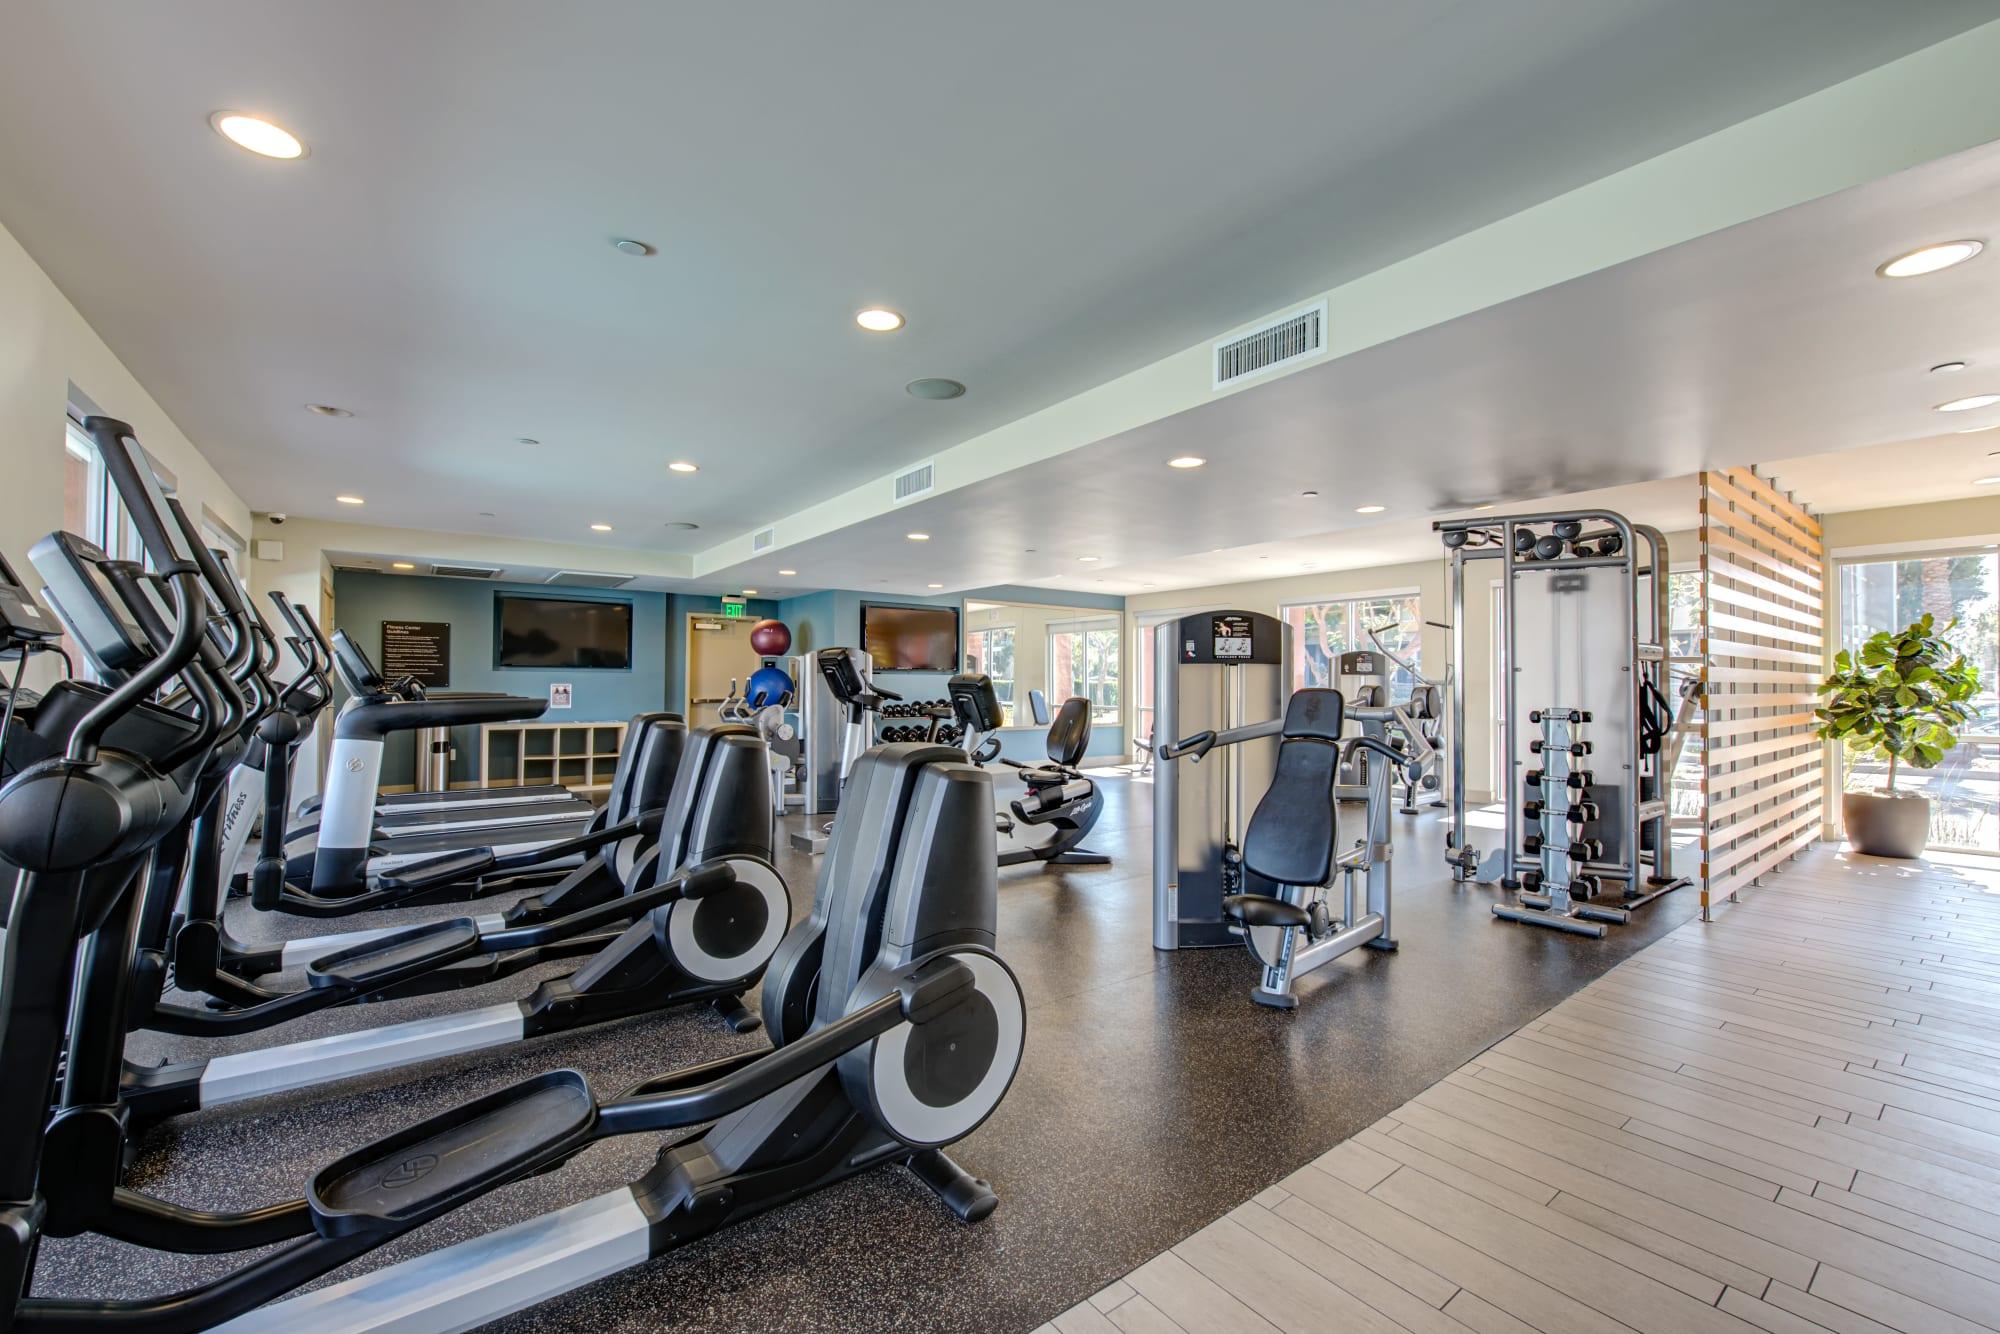 Fully equipped fitness center at Harborside Marina Bay Apartments in Marina del Rey, California